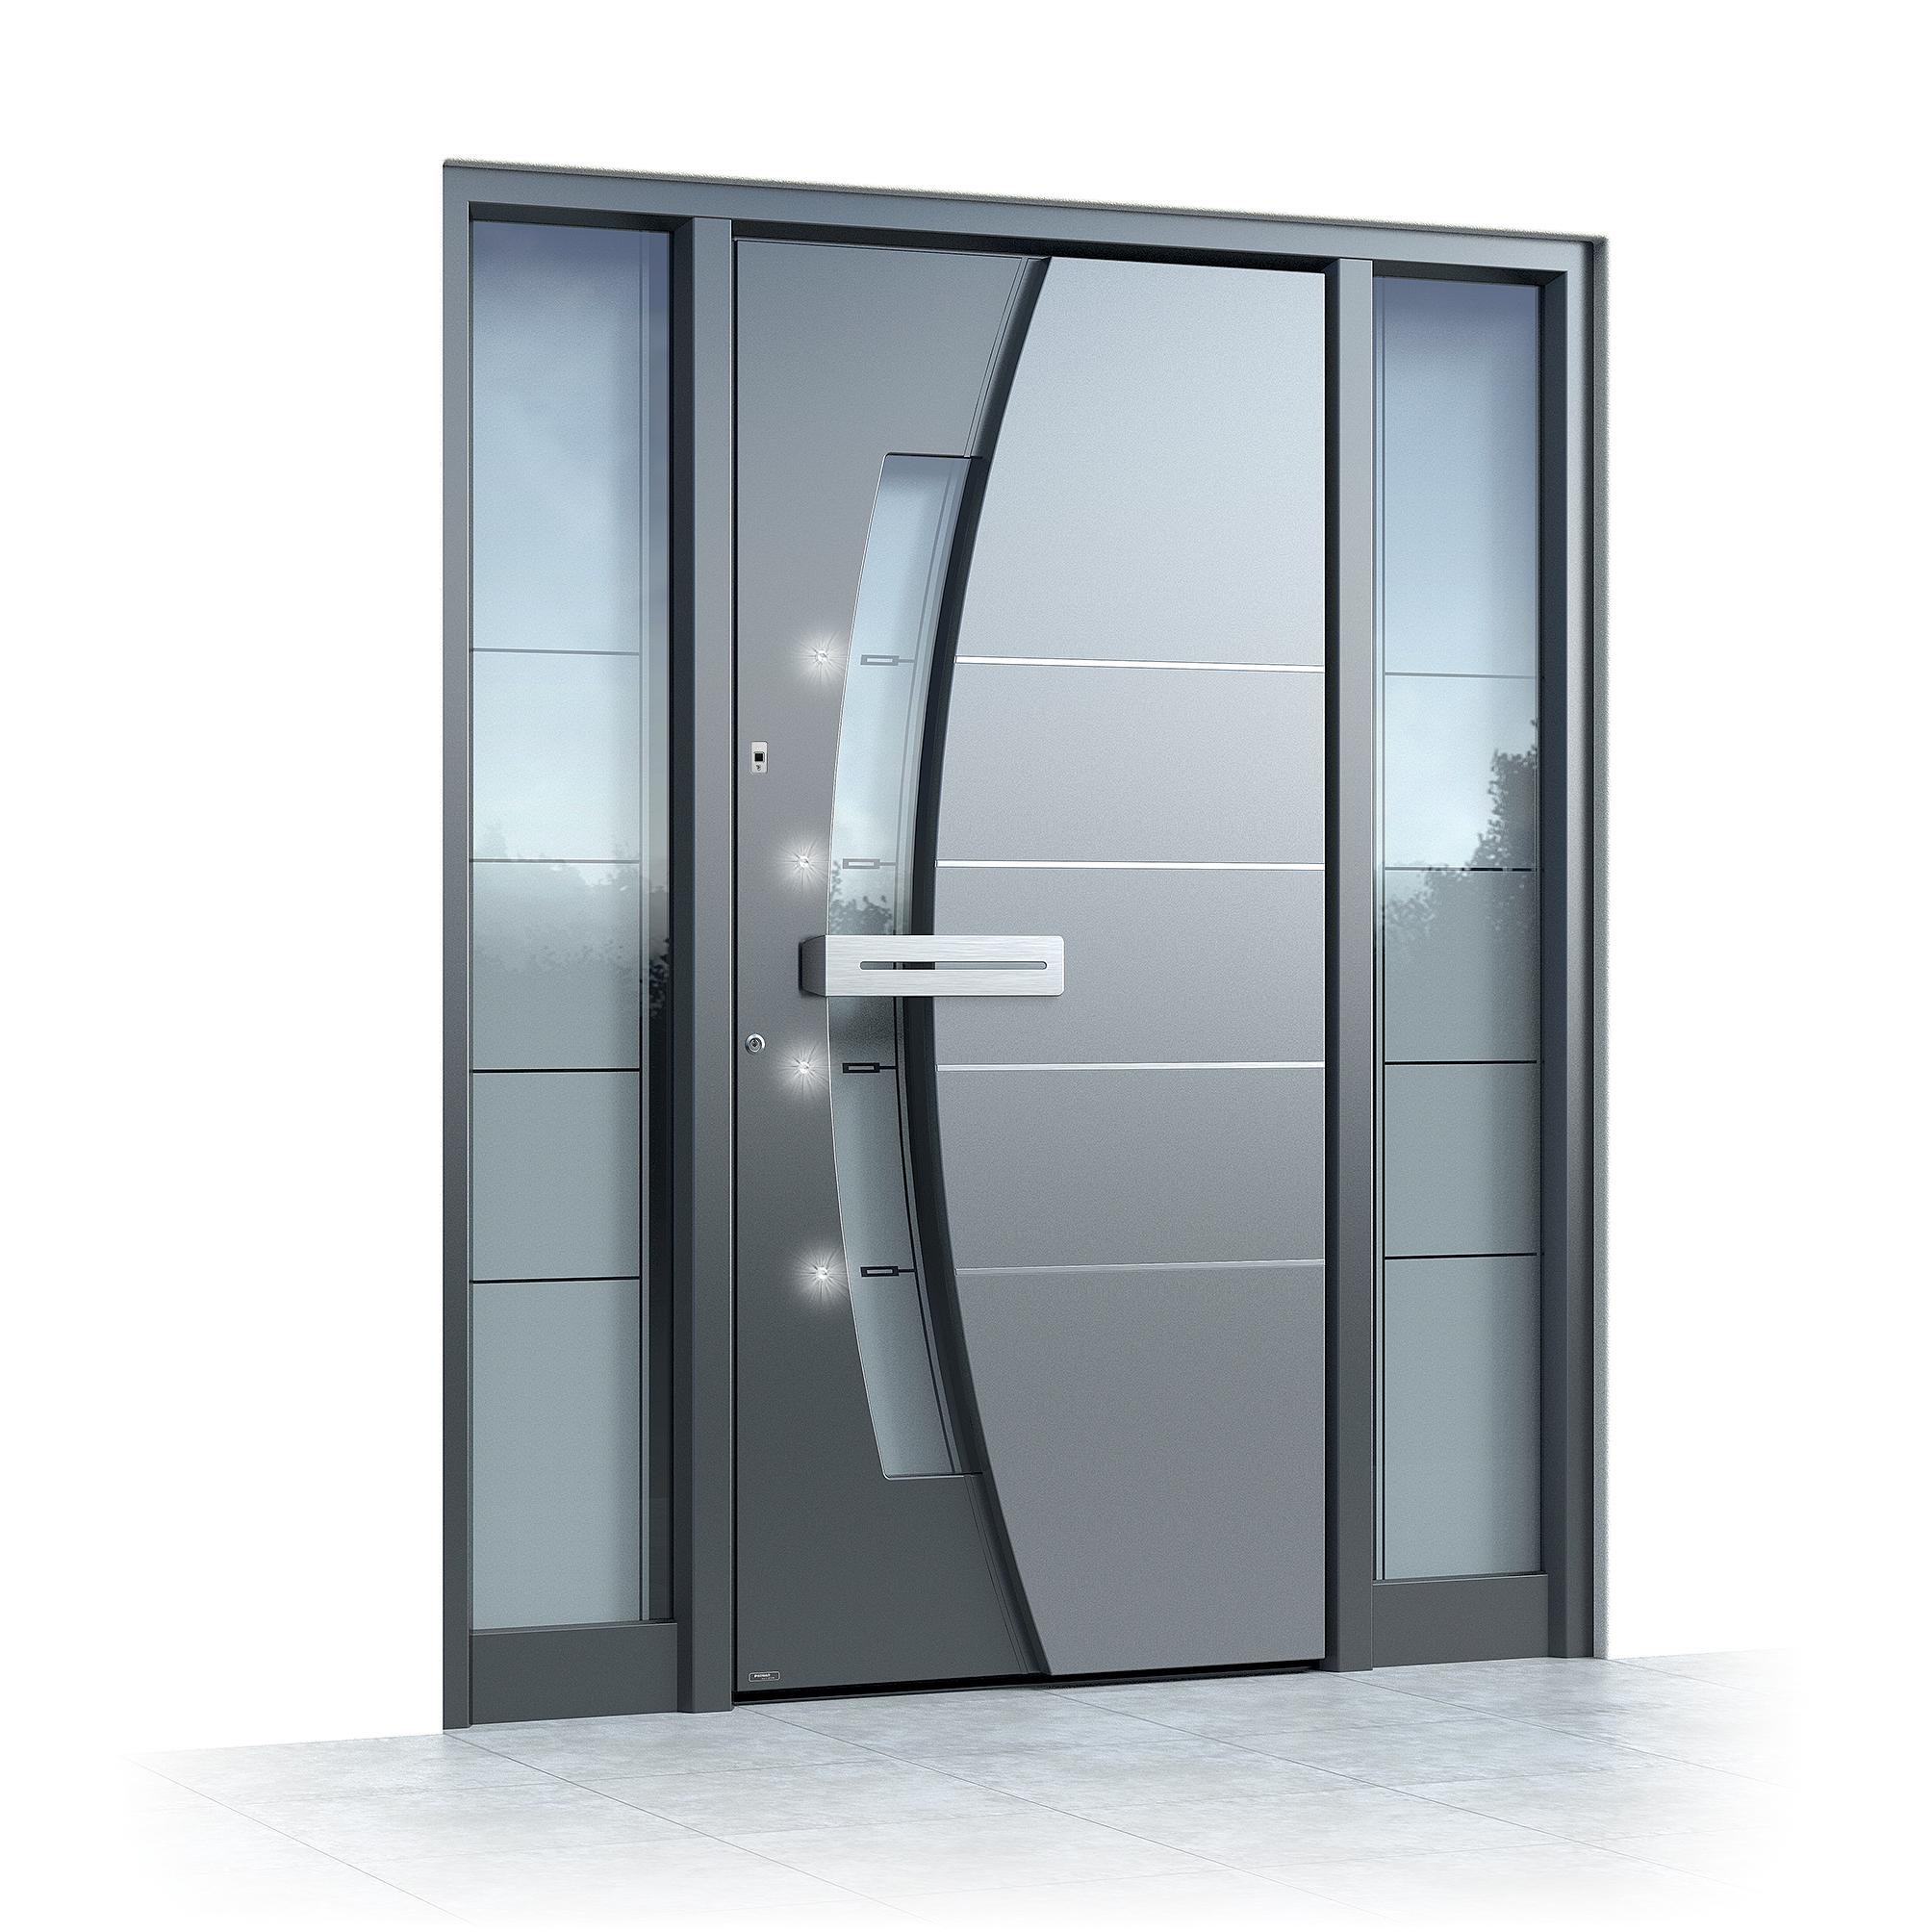 Ușă exterior Pirnar ULTIMUM MULTILEVEL 510